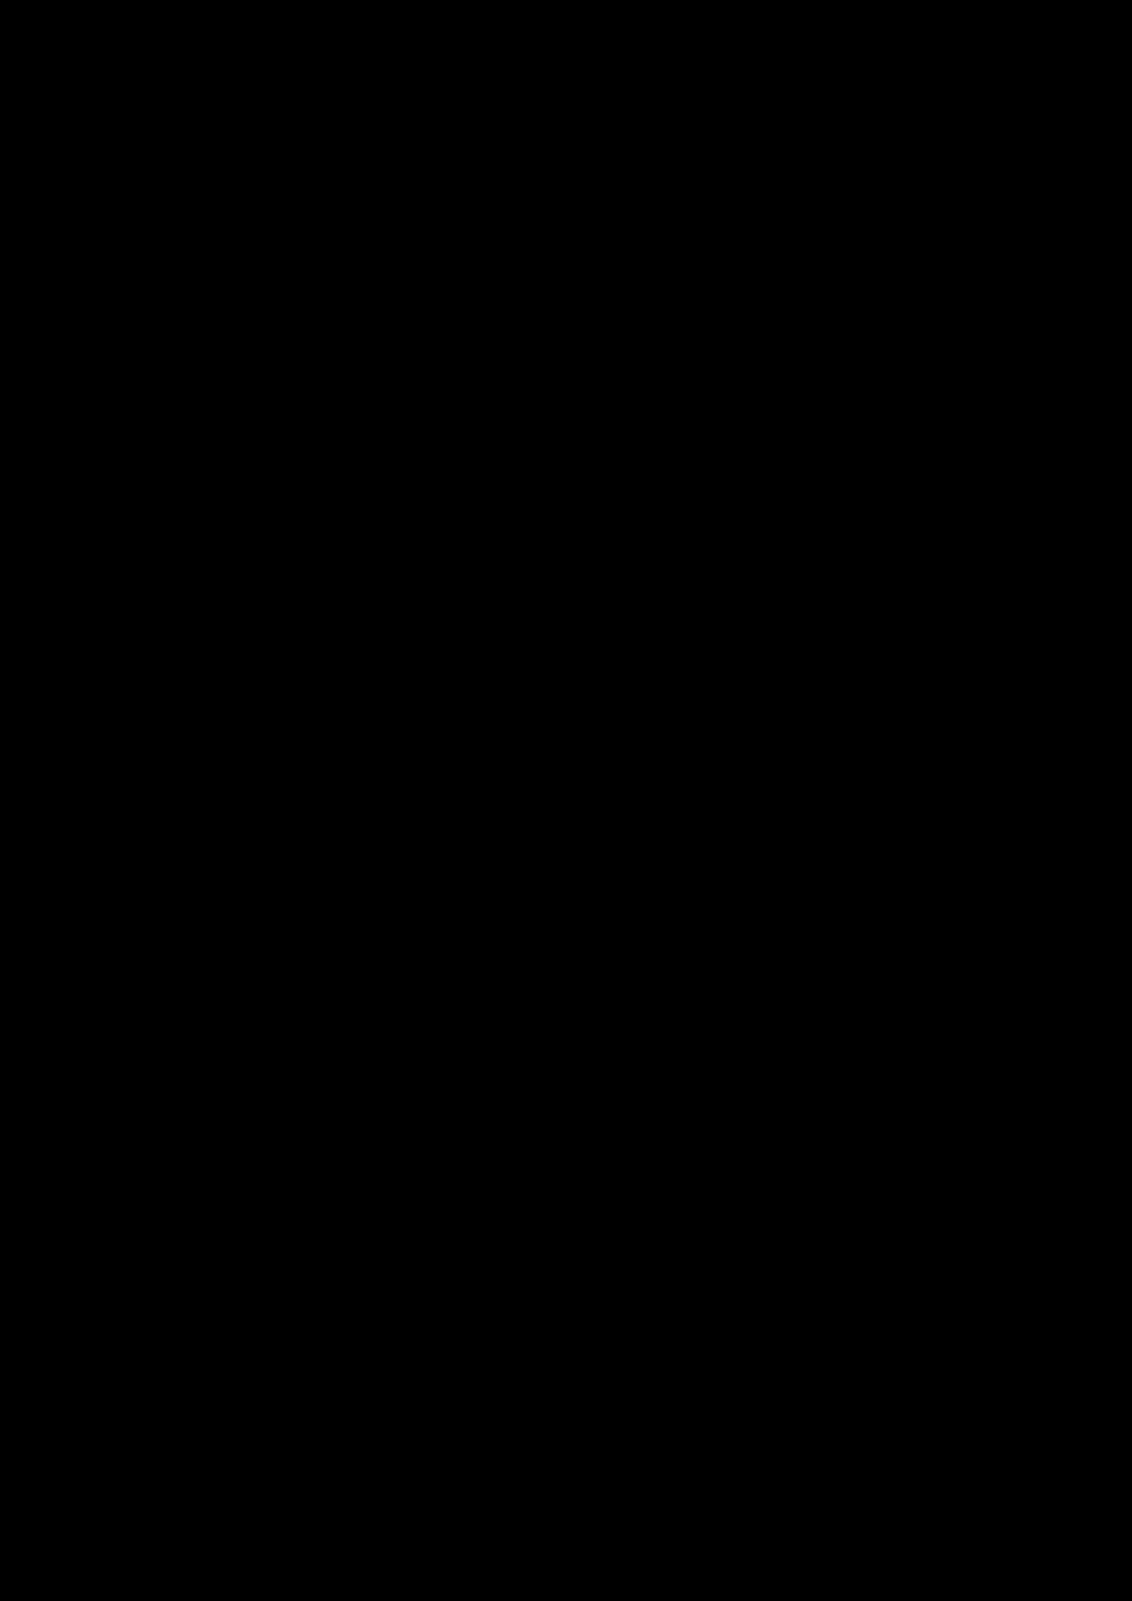 Romans o sleze slide, Image 28